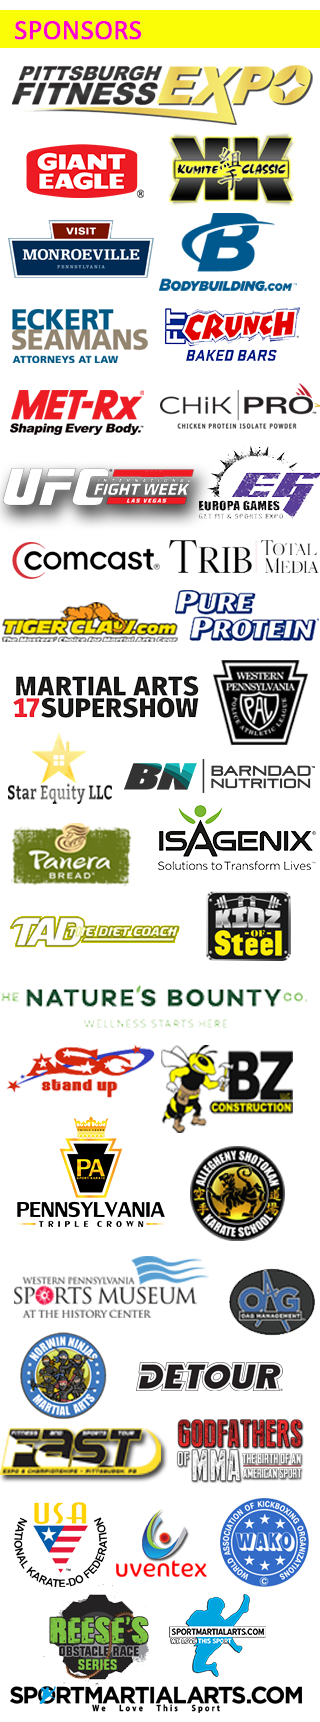 2017-sponsors